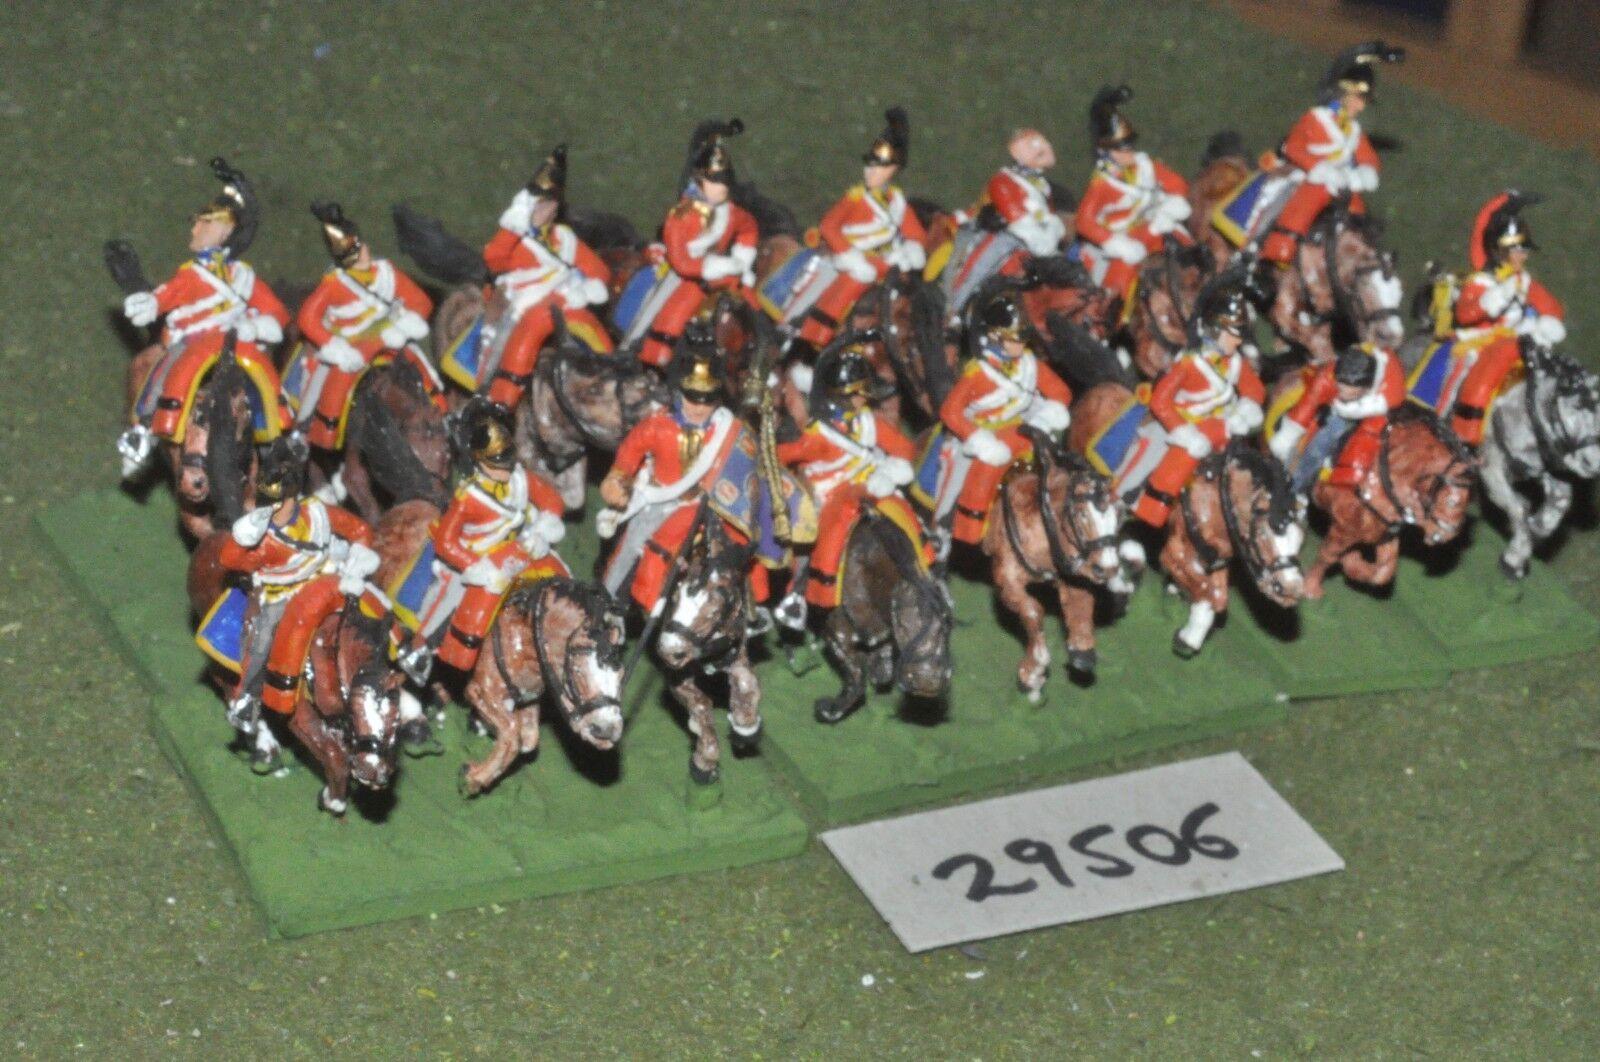 25 mm napoléoniennes/British-Dragoons 16 Figures-CAV Figures-CAV Figures-CAV (29506) 9b32d3